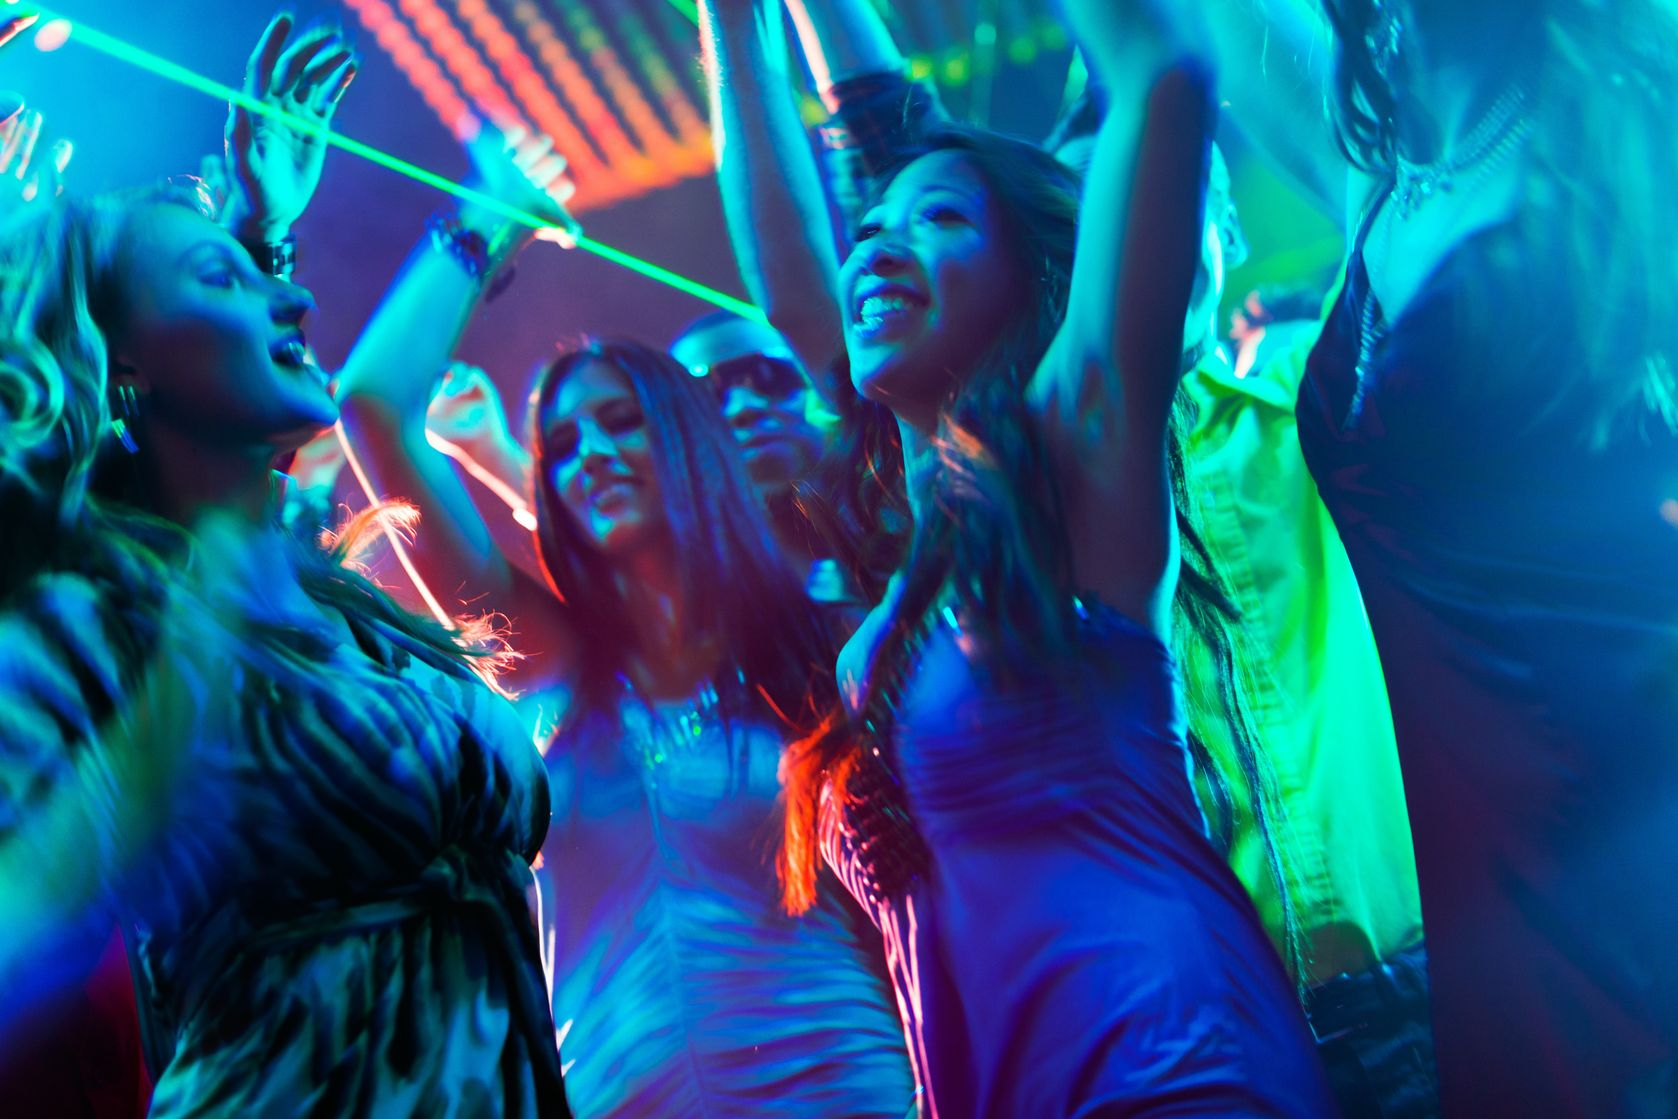 find nightlife companions in tijuana, mexico   partnerseek